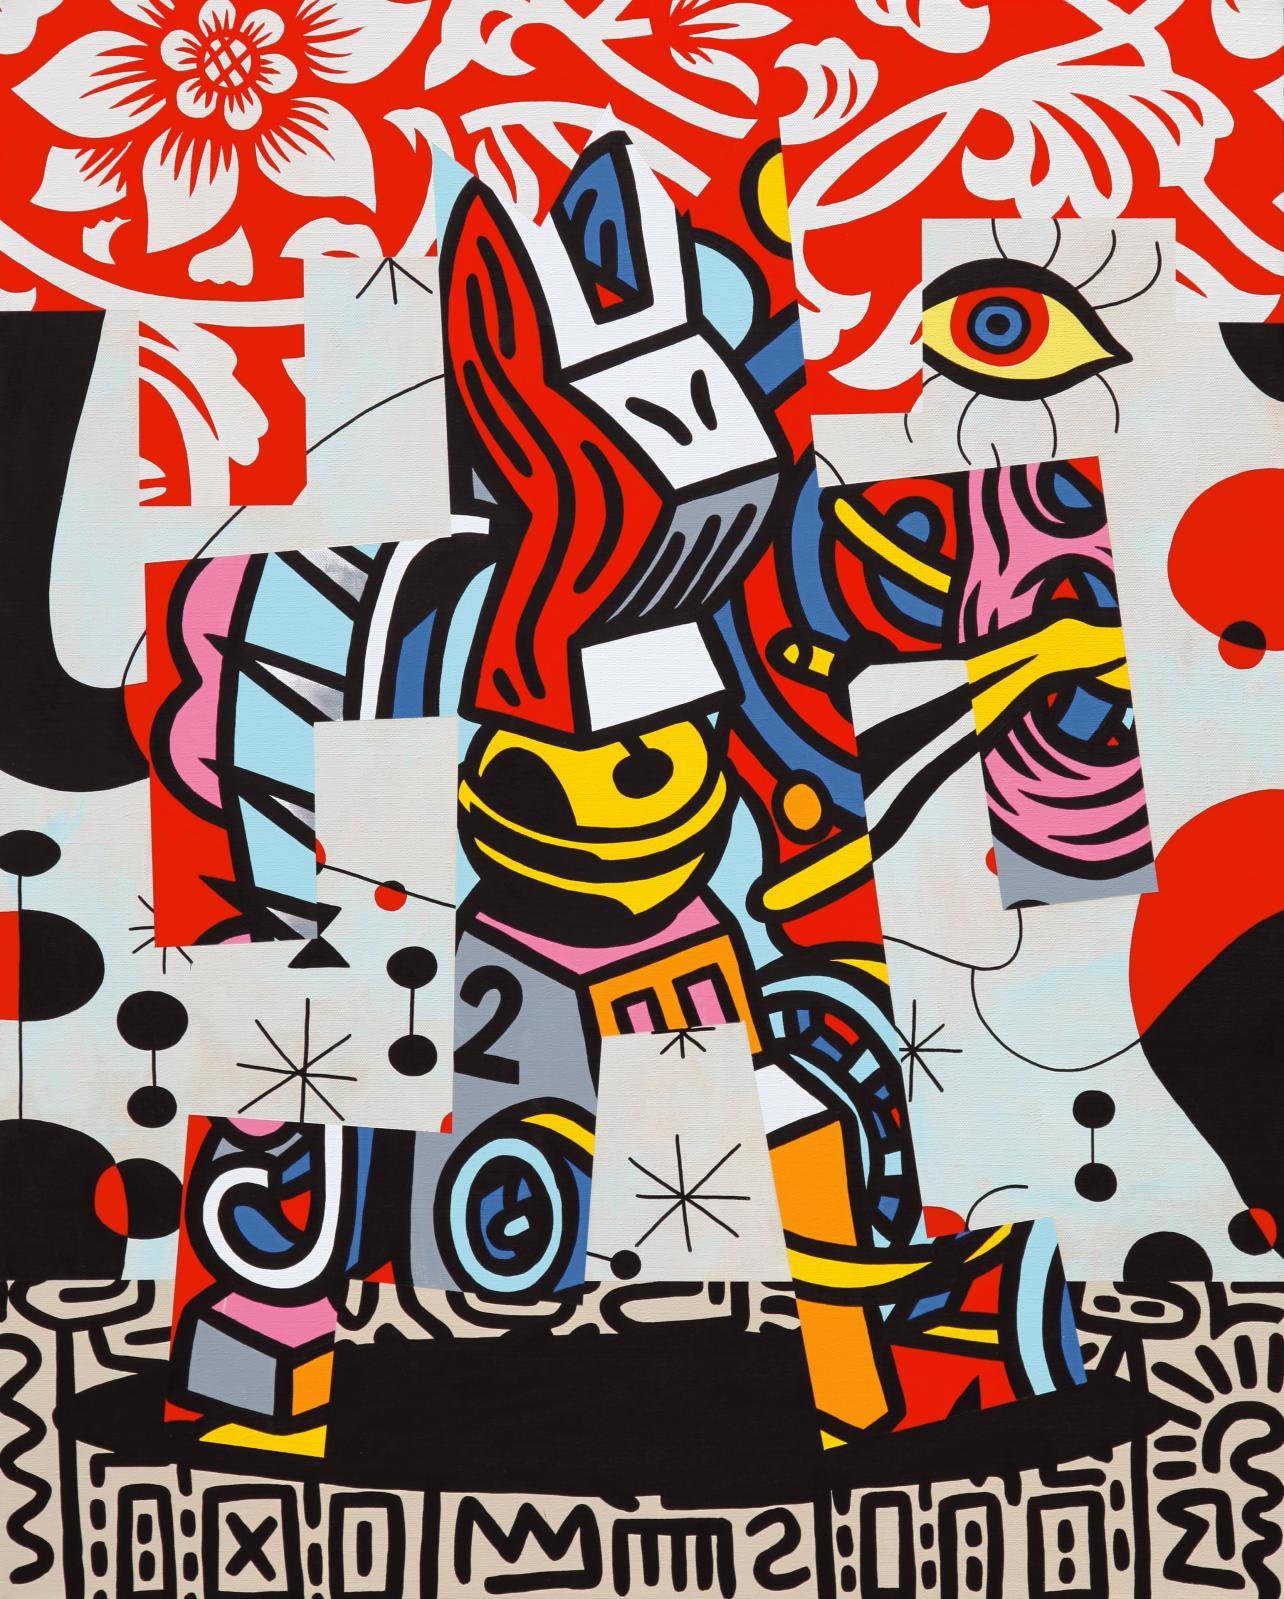 Speedy Graphito, Escapade, 2020, acrylique sur toile, 81 x 65 cm. COURTESY GALERIE POLARIS